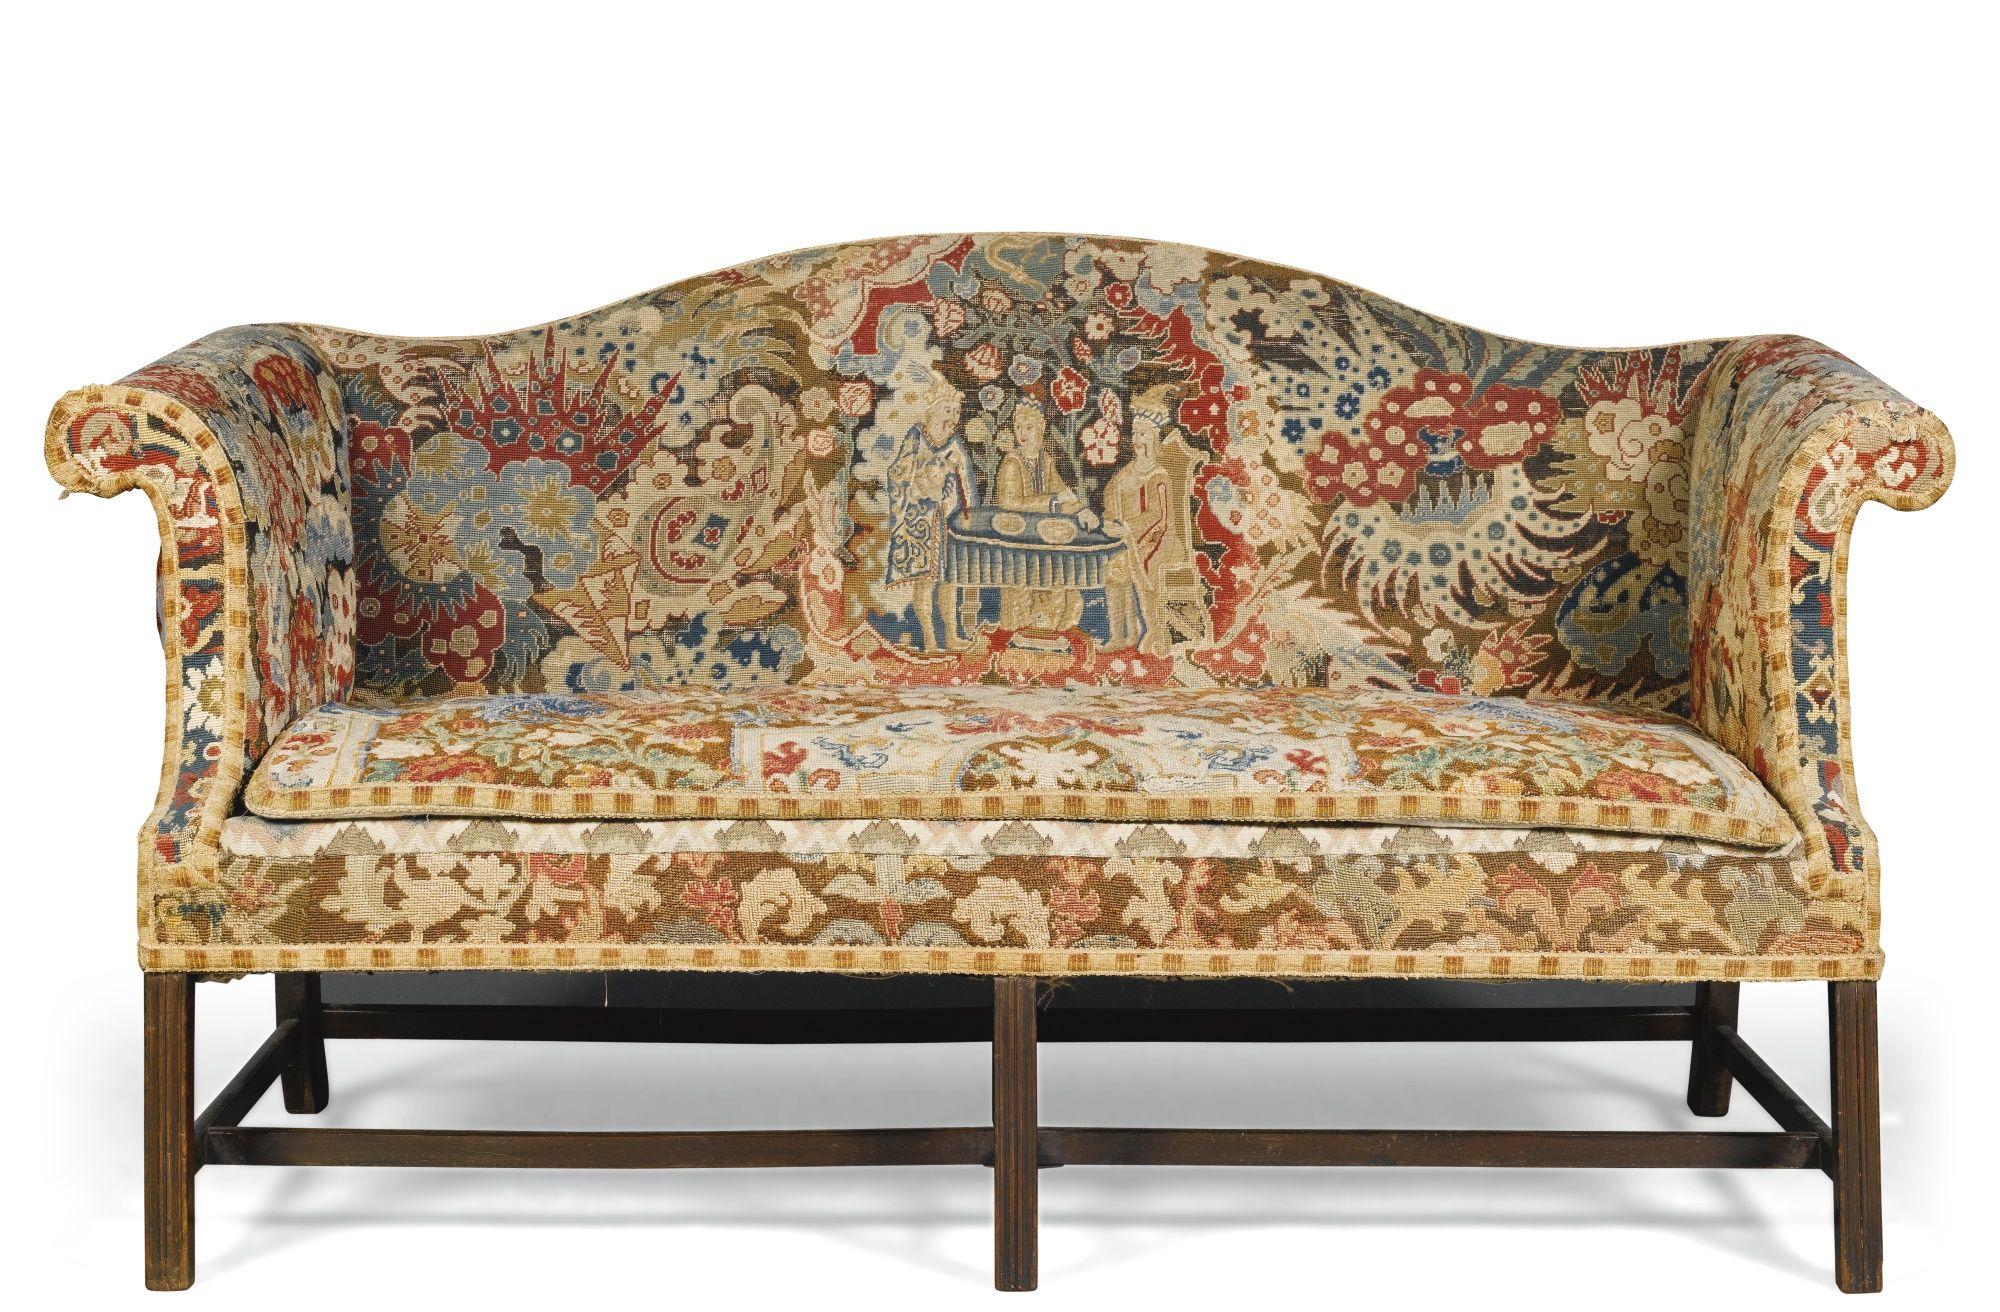 A fabulous needlepoint covered camelback sofa